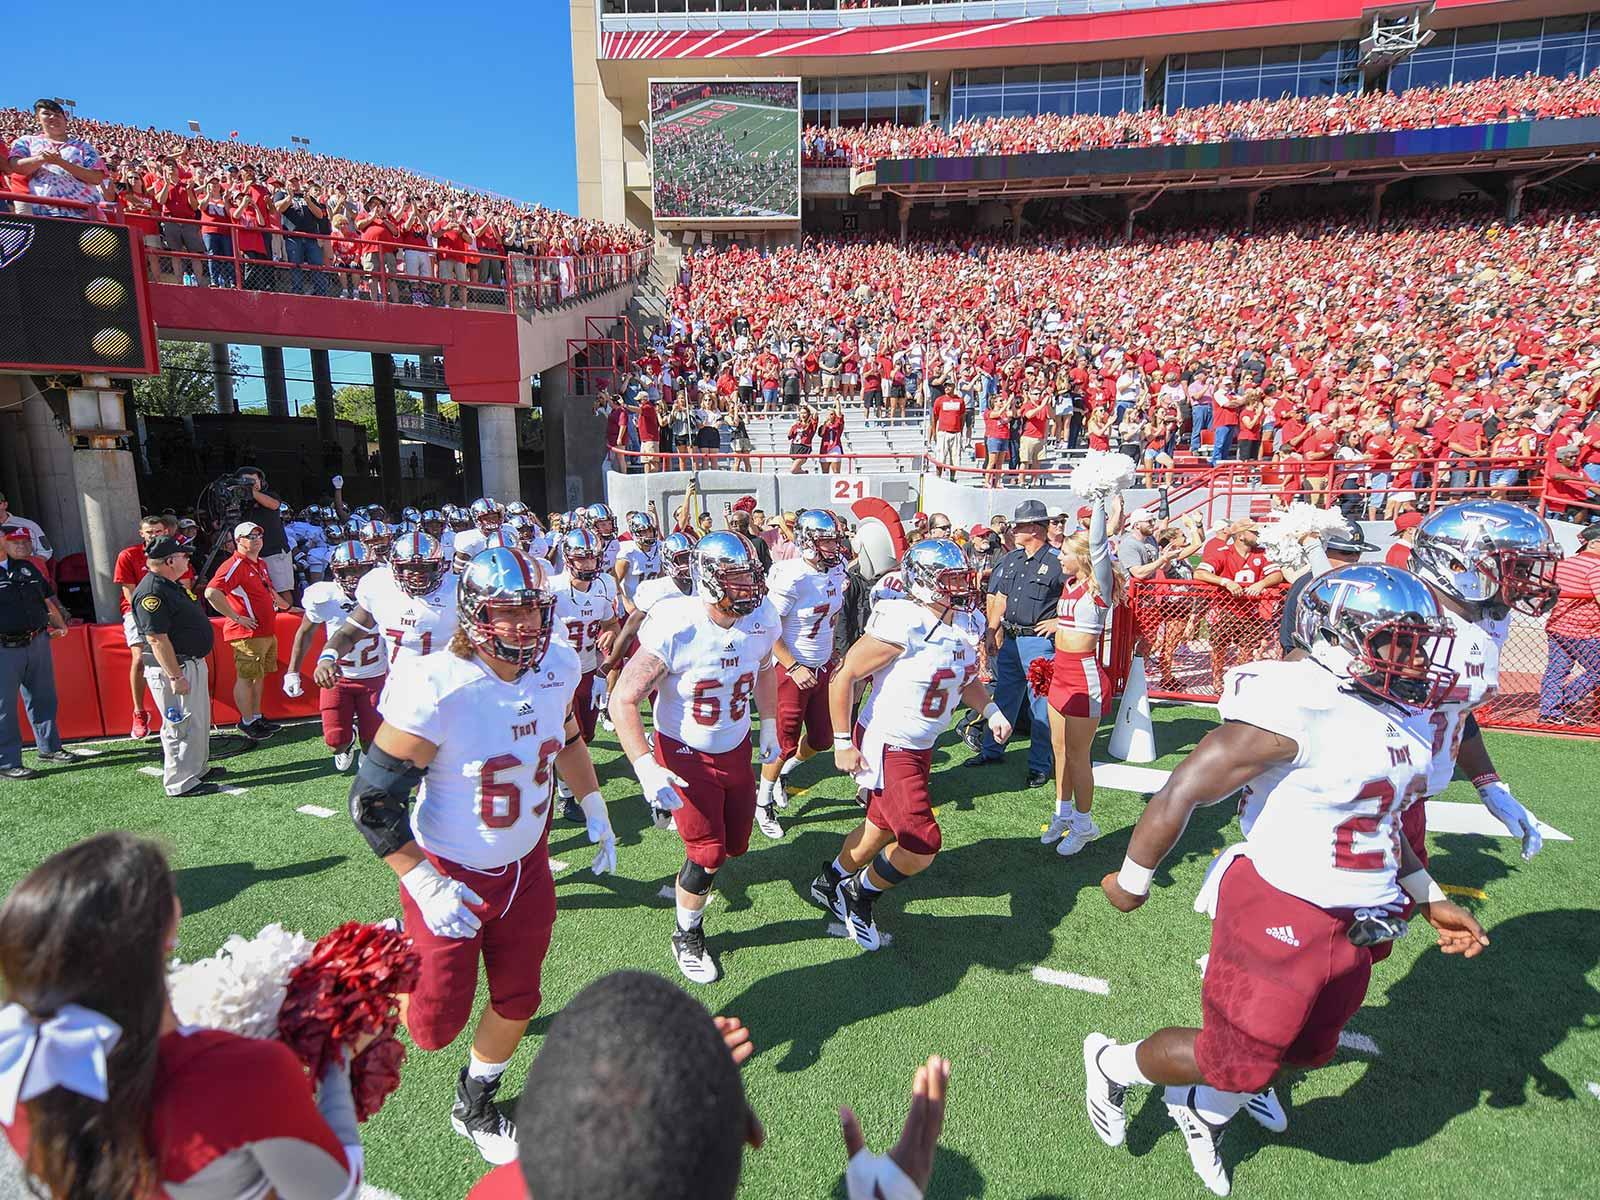 Troy vs. Nebraska: Trojans win at Memorial Stadium